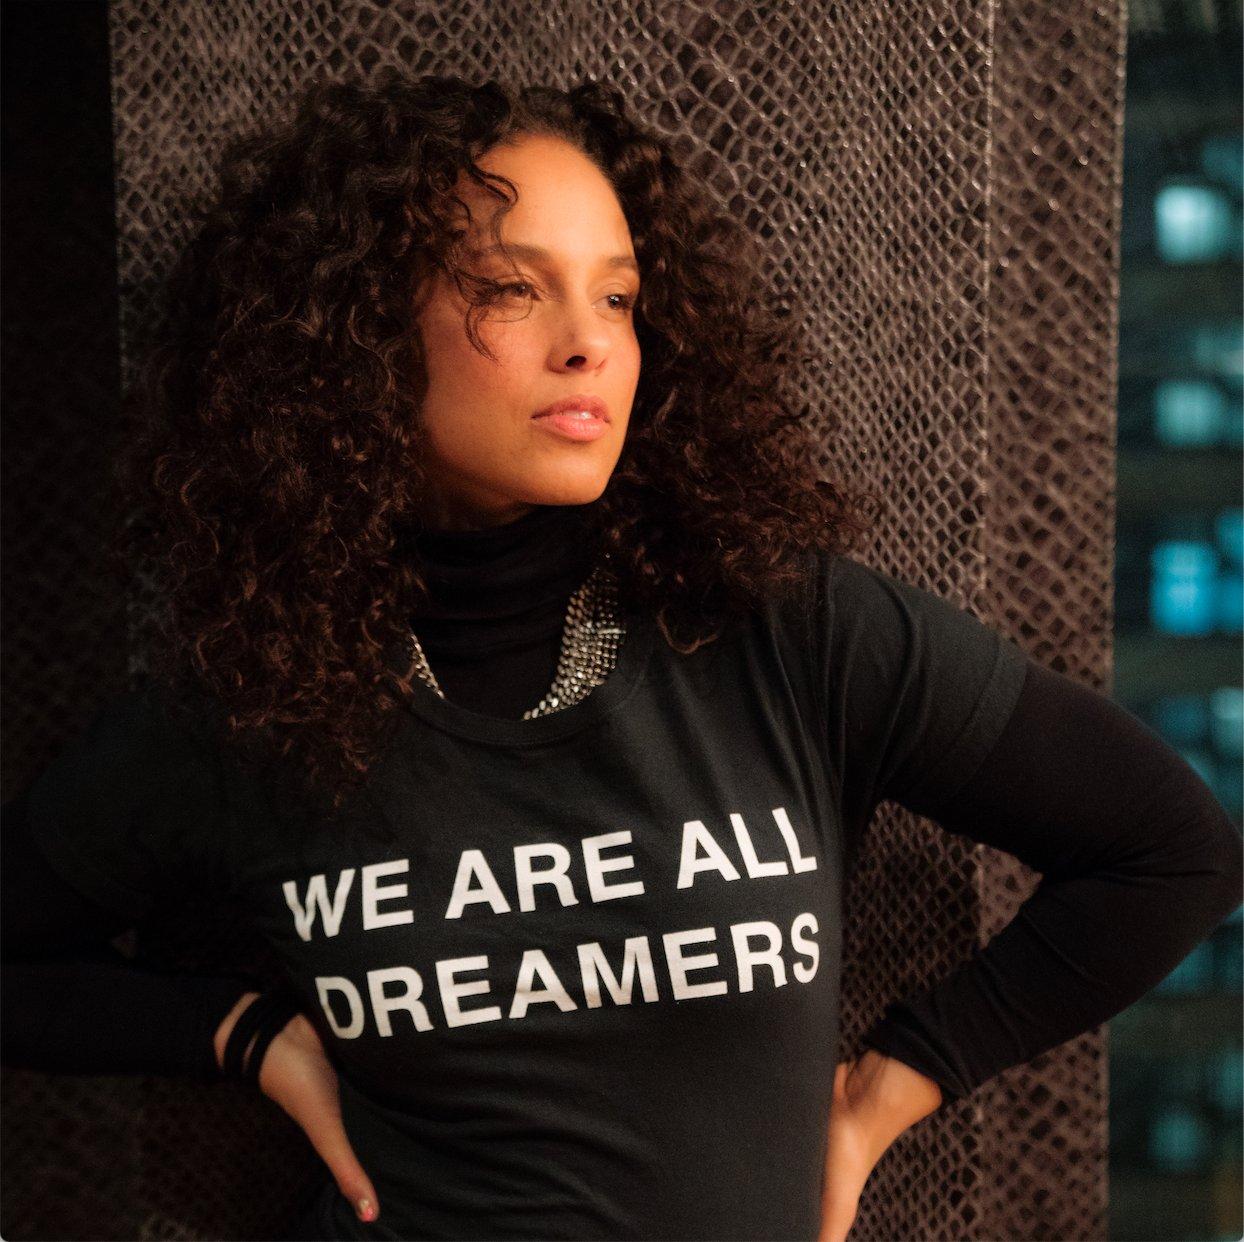 #ShowLove ��  #DreamActNow #WeAreAllDreamers https://t.co/gE0FxStHNn